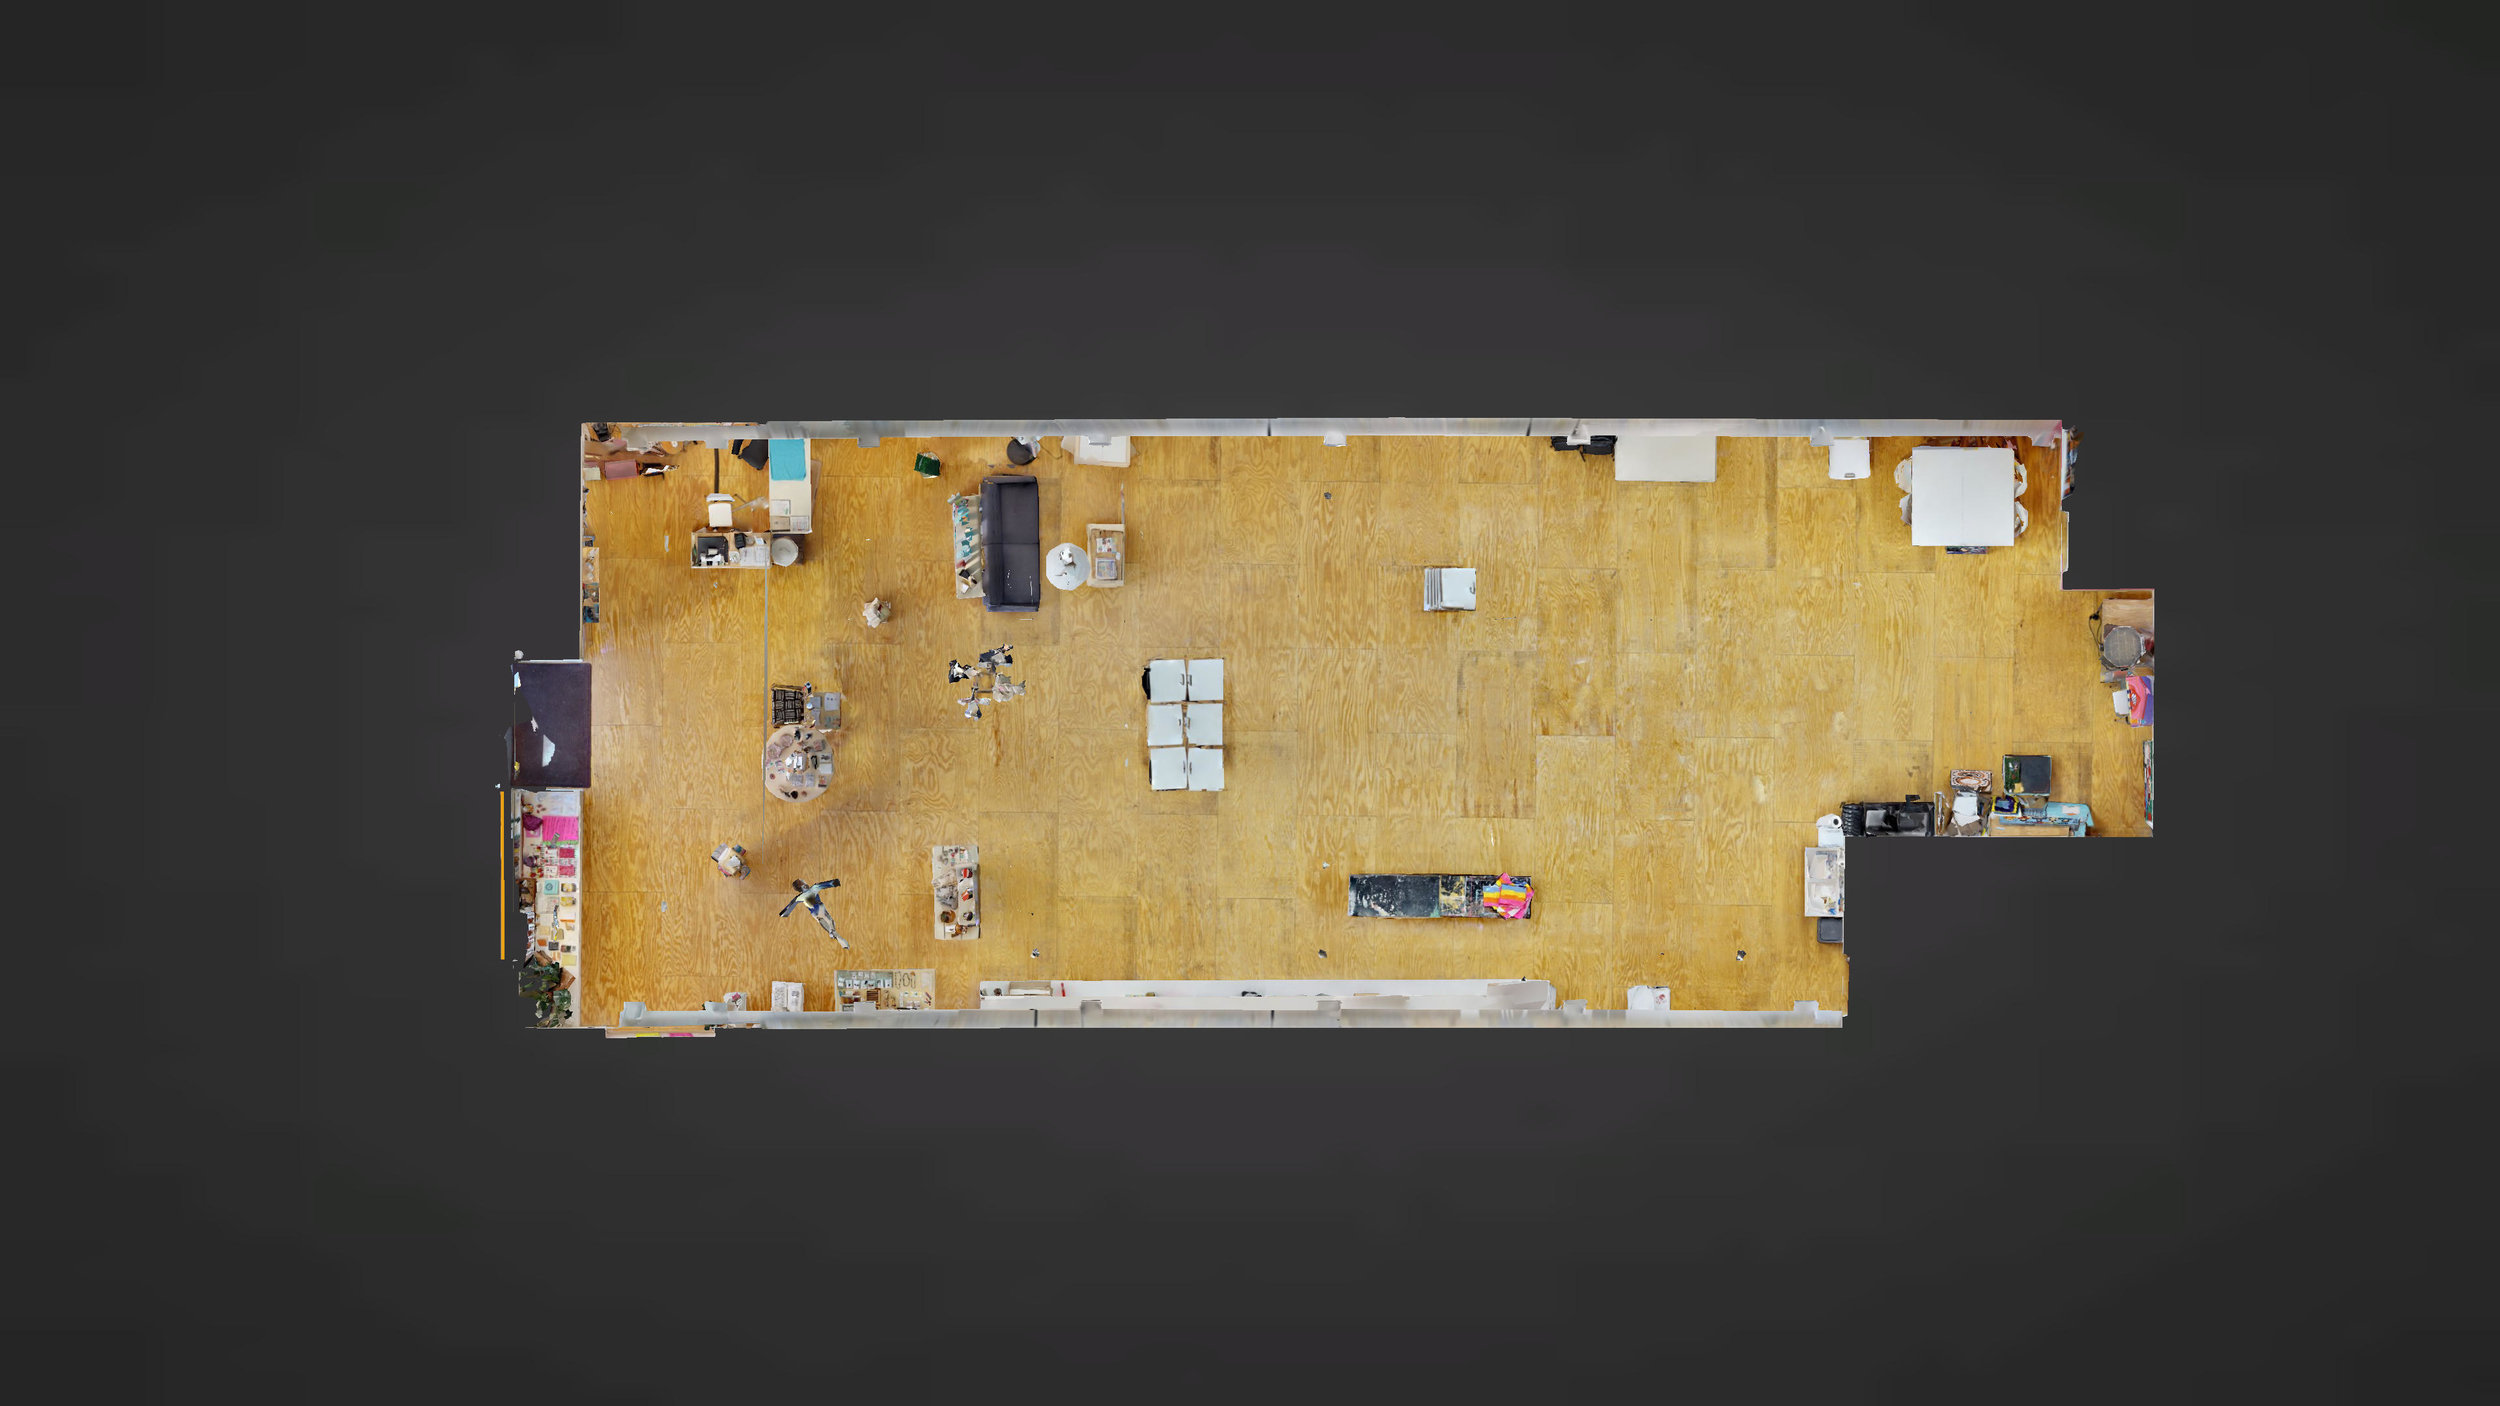 Xrxi1FpttpX - Floorplan.jpg